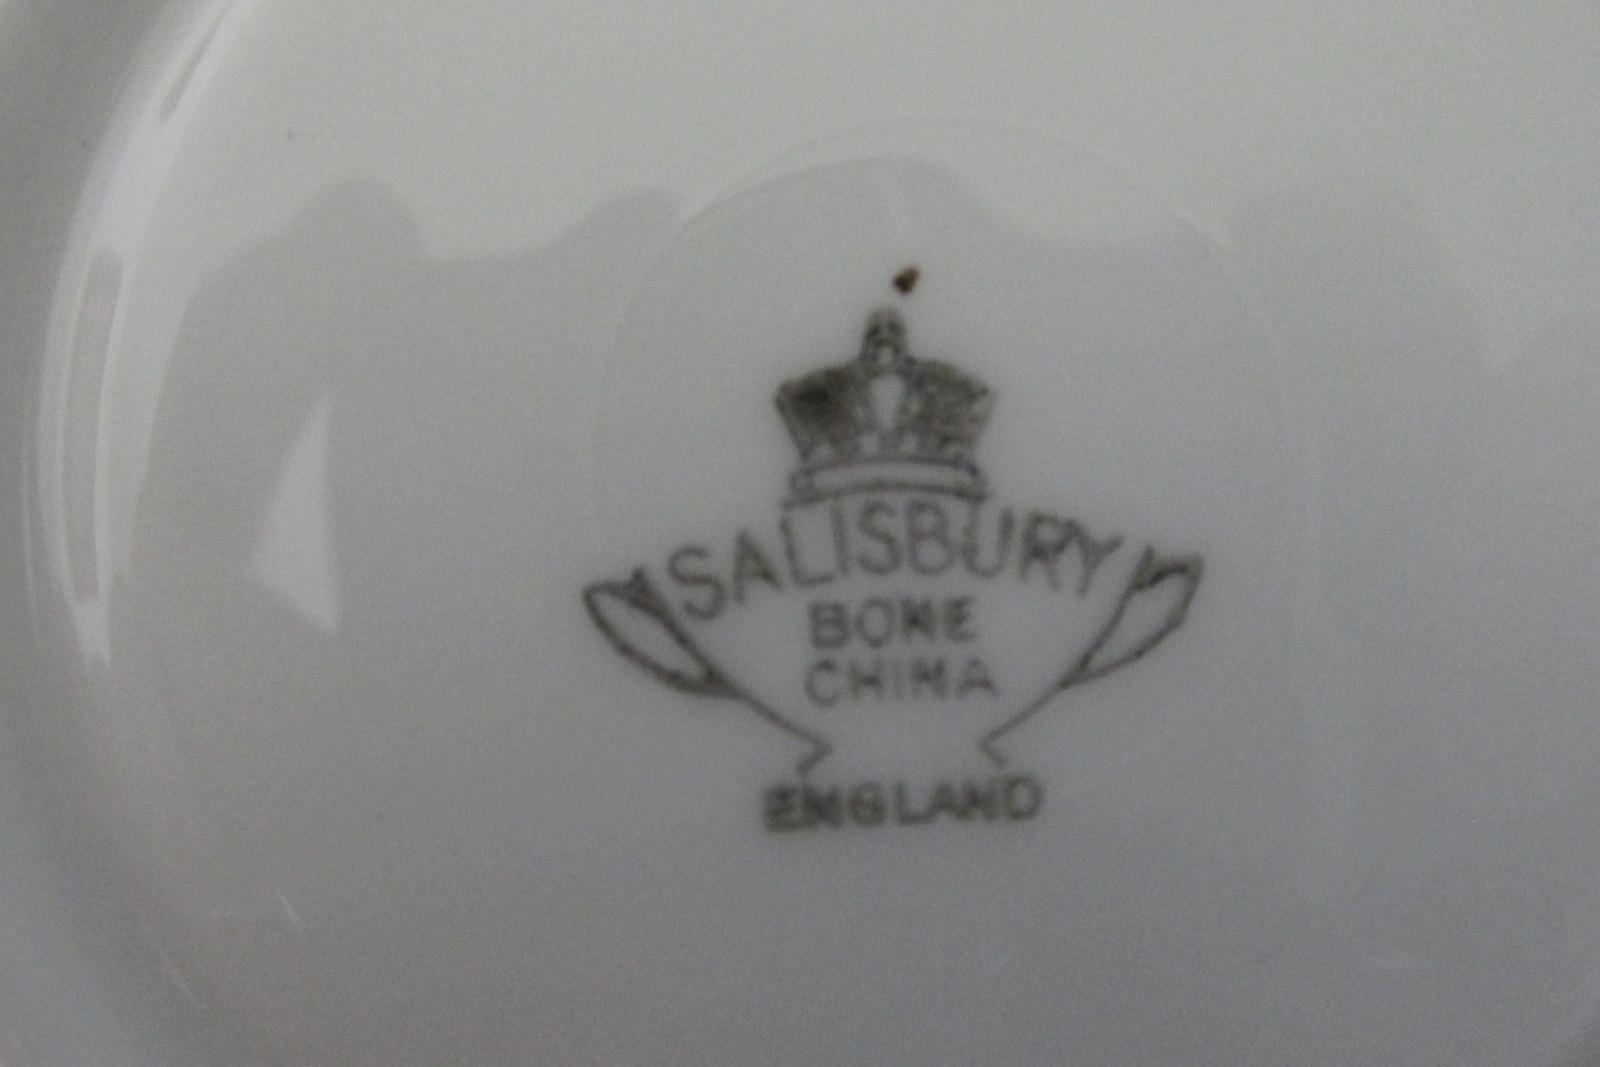 Rare Ship Pattern Cup & Saucer - Salisbury English Bone China, 1950s / 1960s